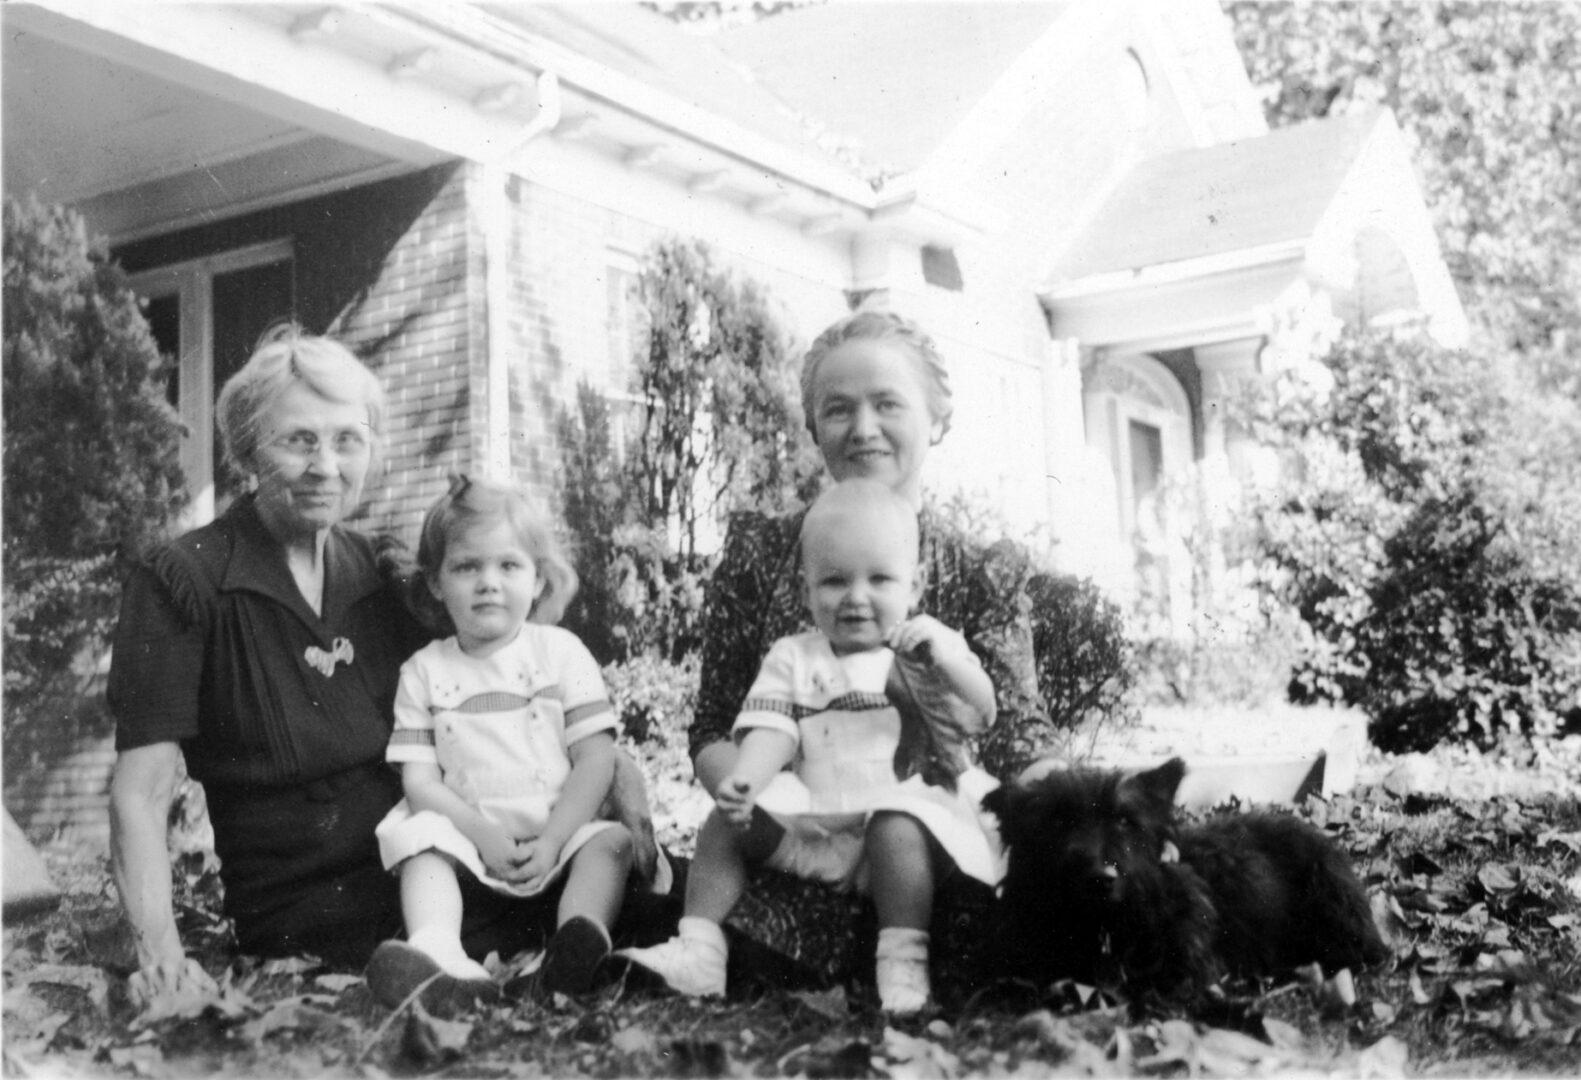 Aunt Dora and Auntie with Lillie, Demaris, and Scottie